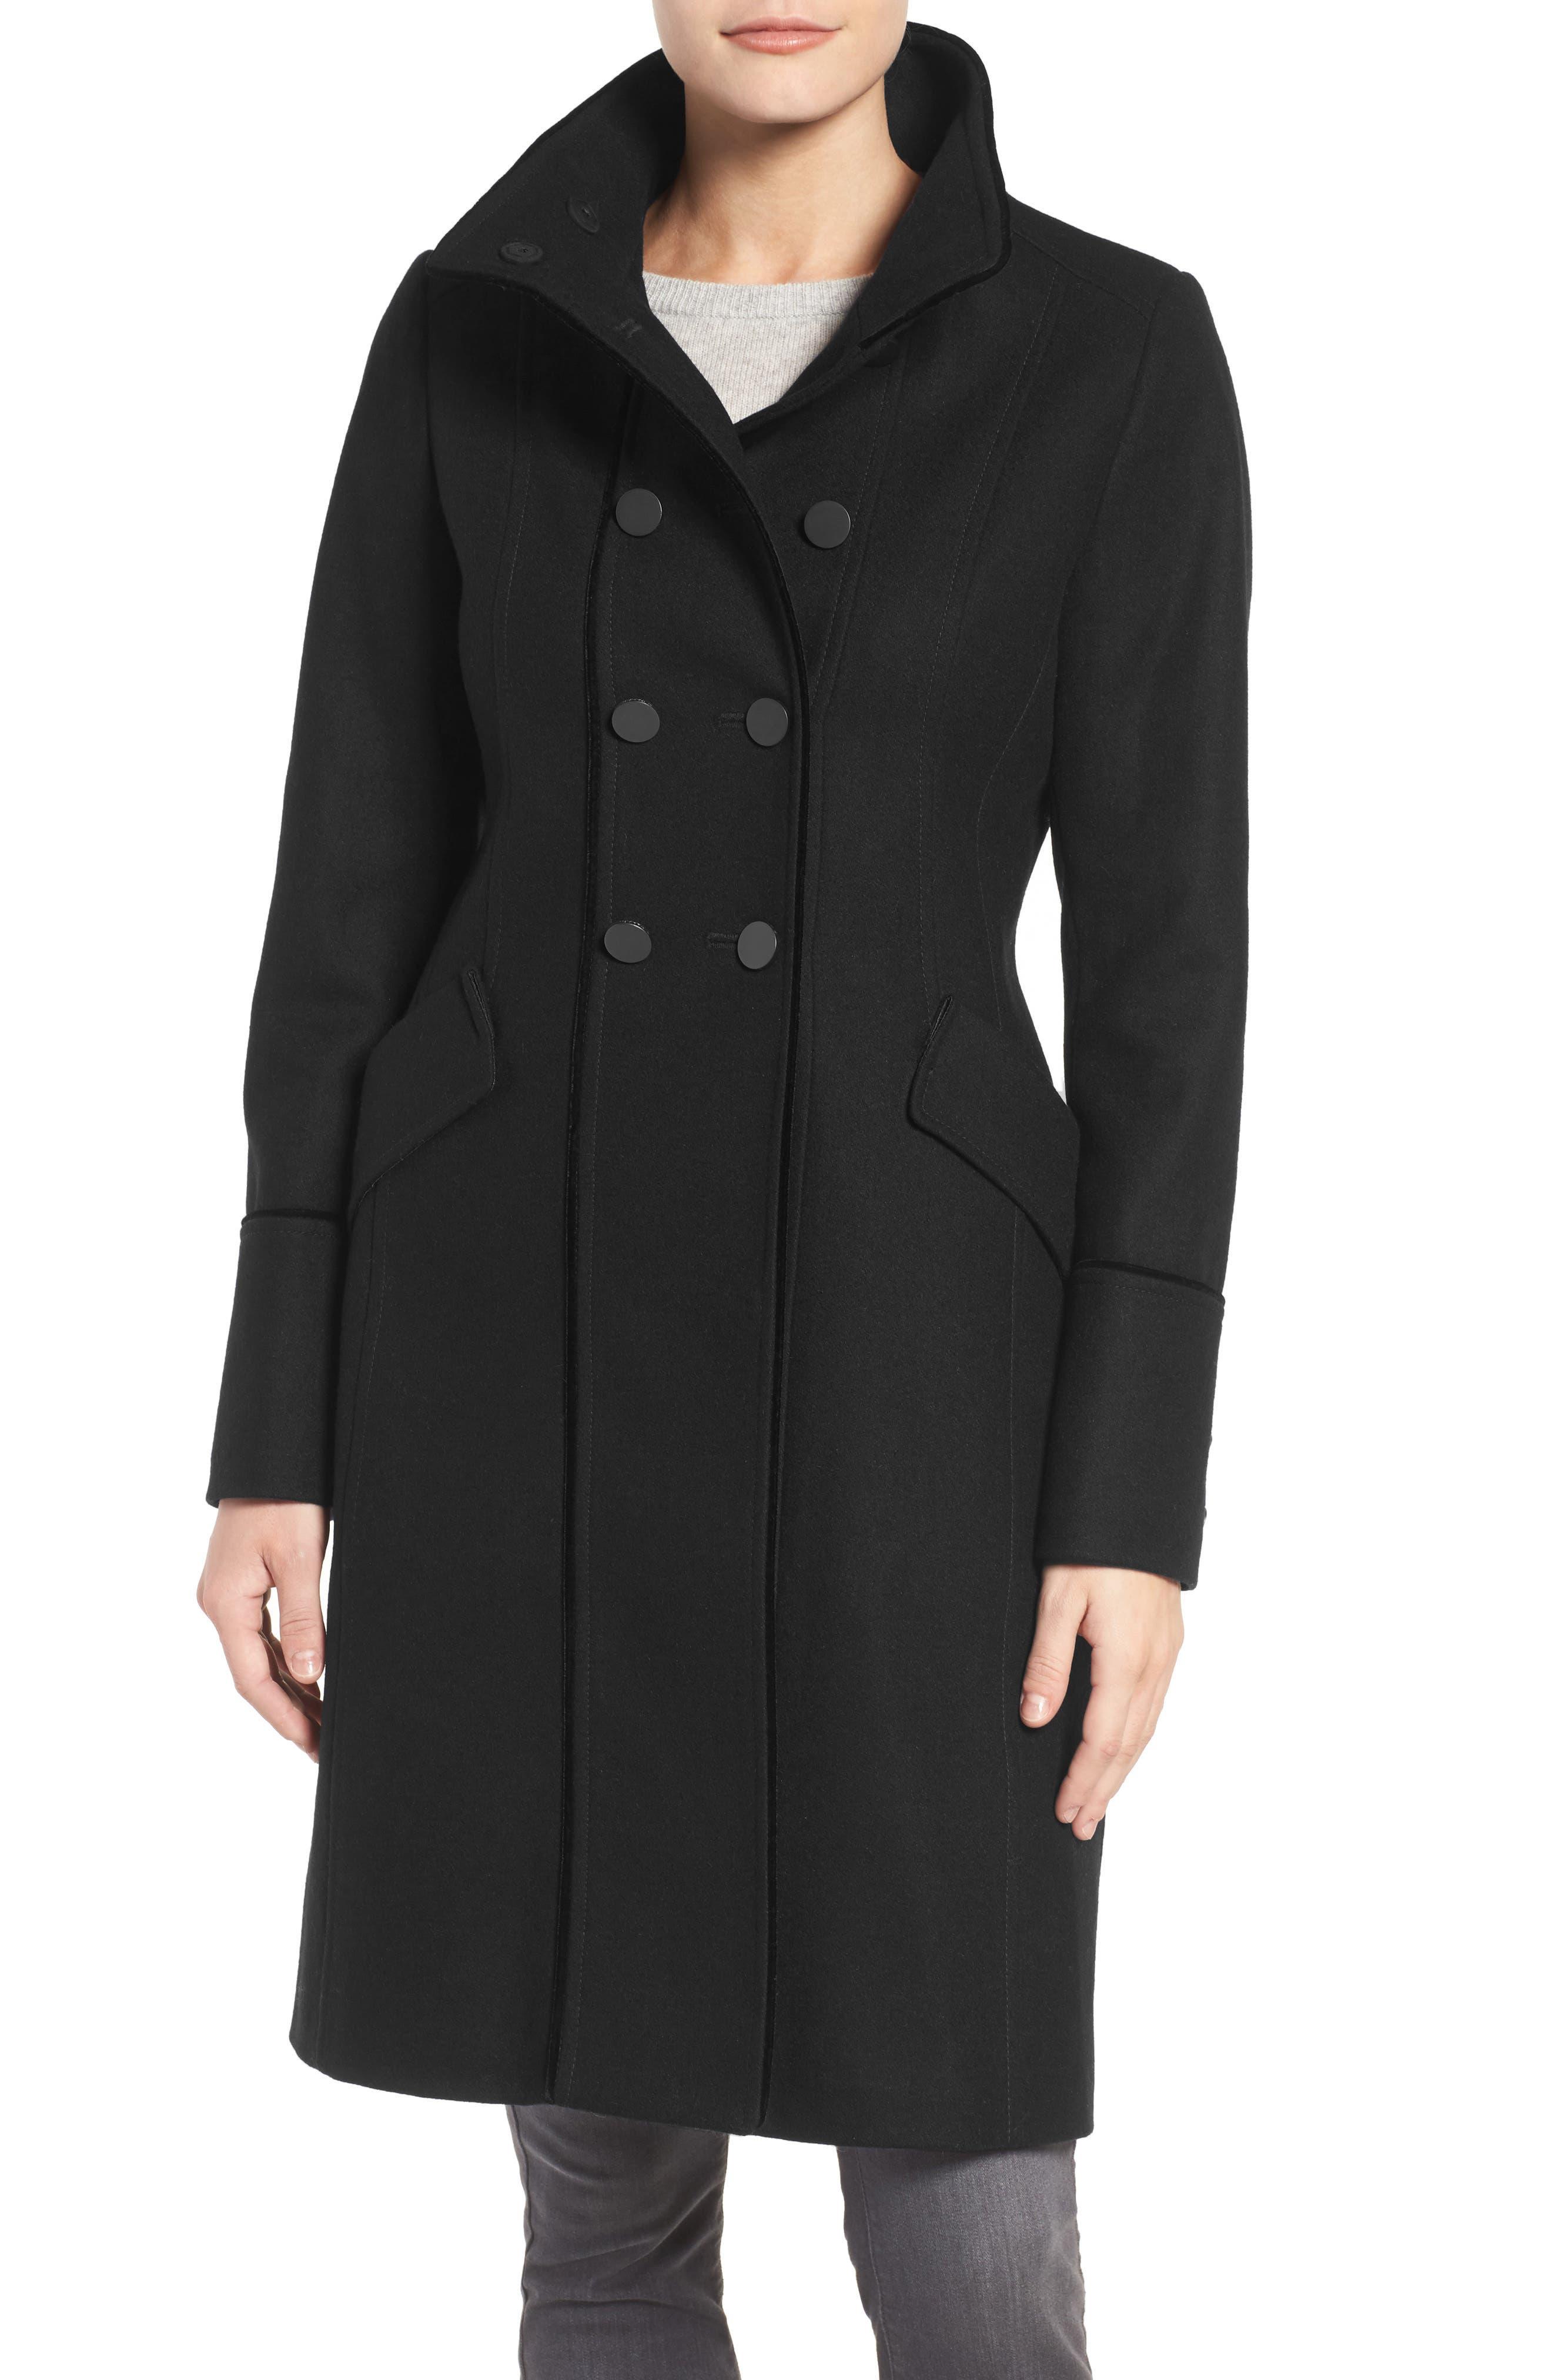 Alice Wool Blend Officer's Coat, Main, color, 001